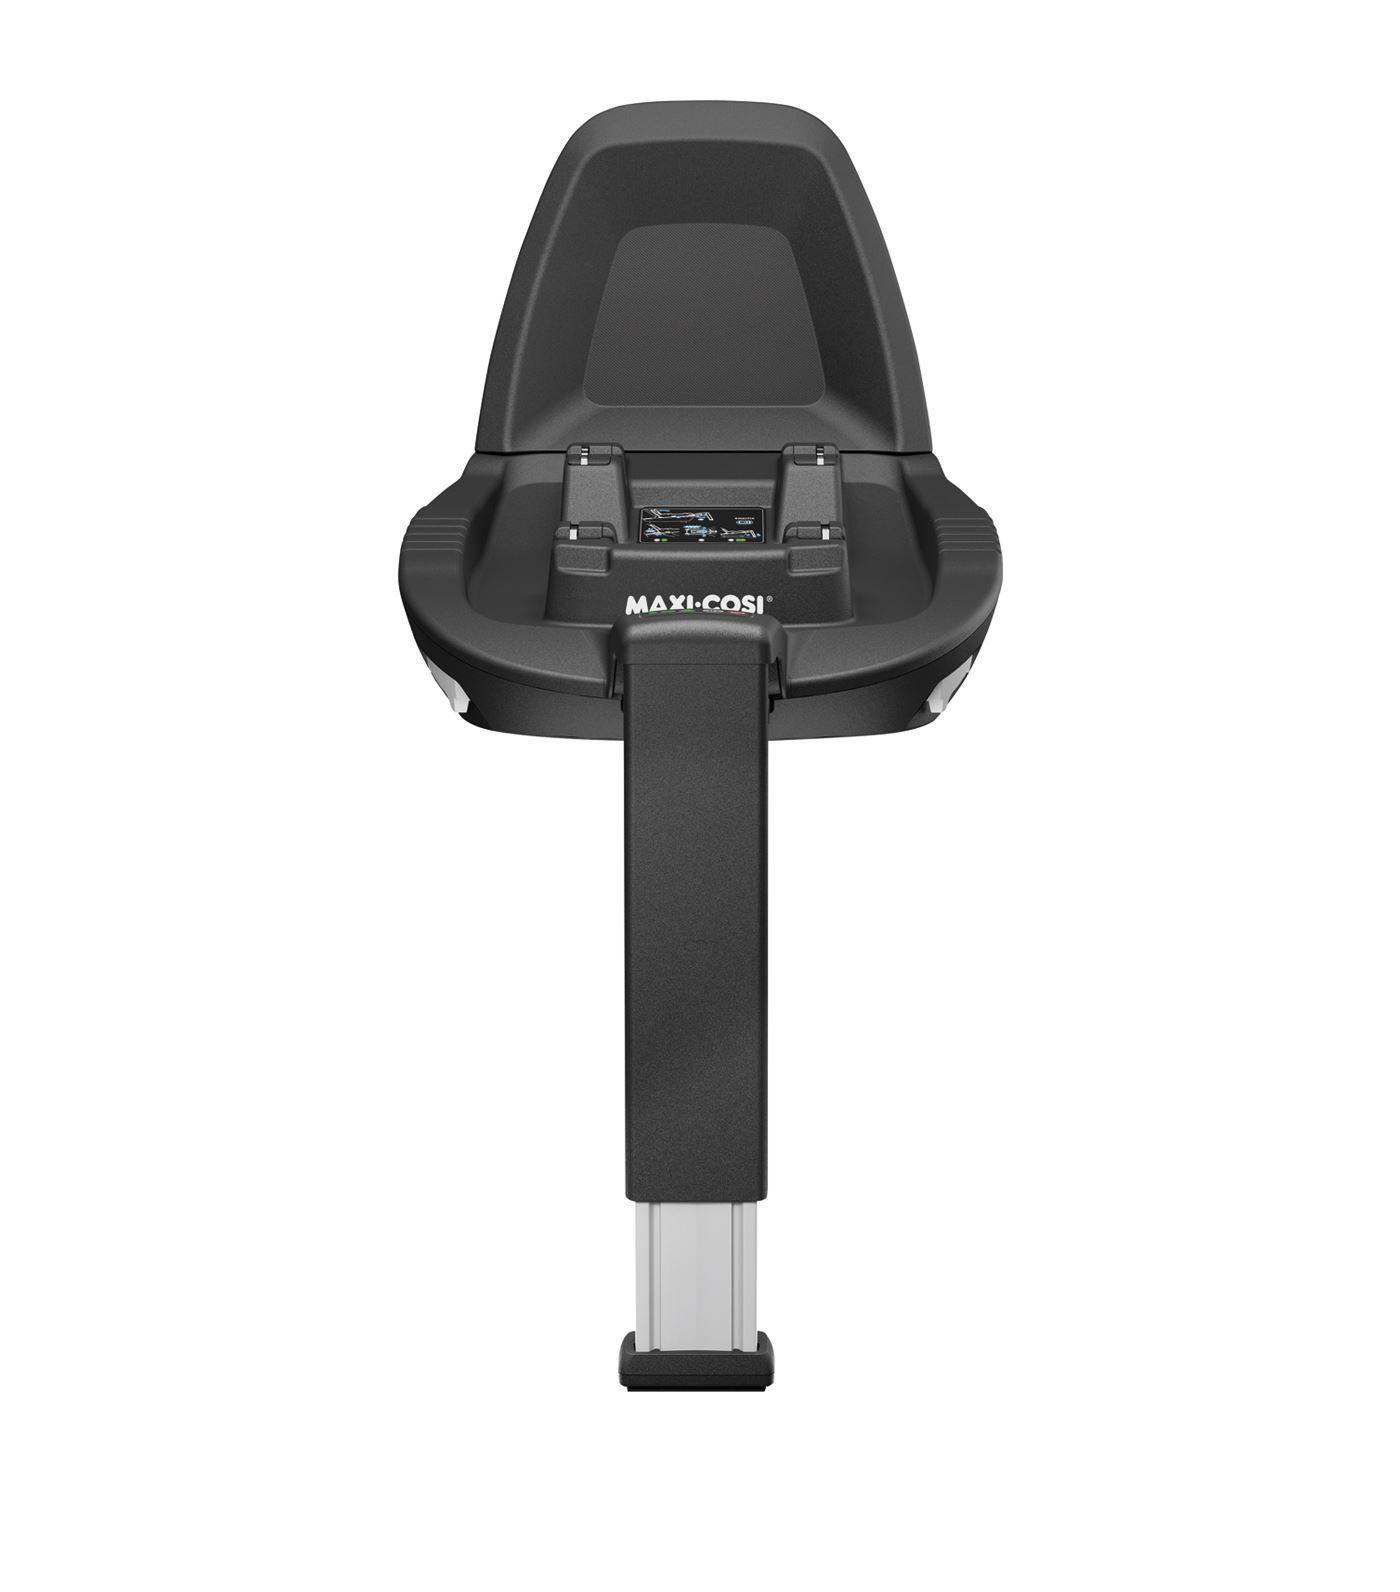 Maxi Cosi 3wayfix Car Seat Base Ad Affiliate Wayfix Cosi Maxi Base Seat Car Seat Base Car Seats Maxi Cosi